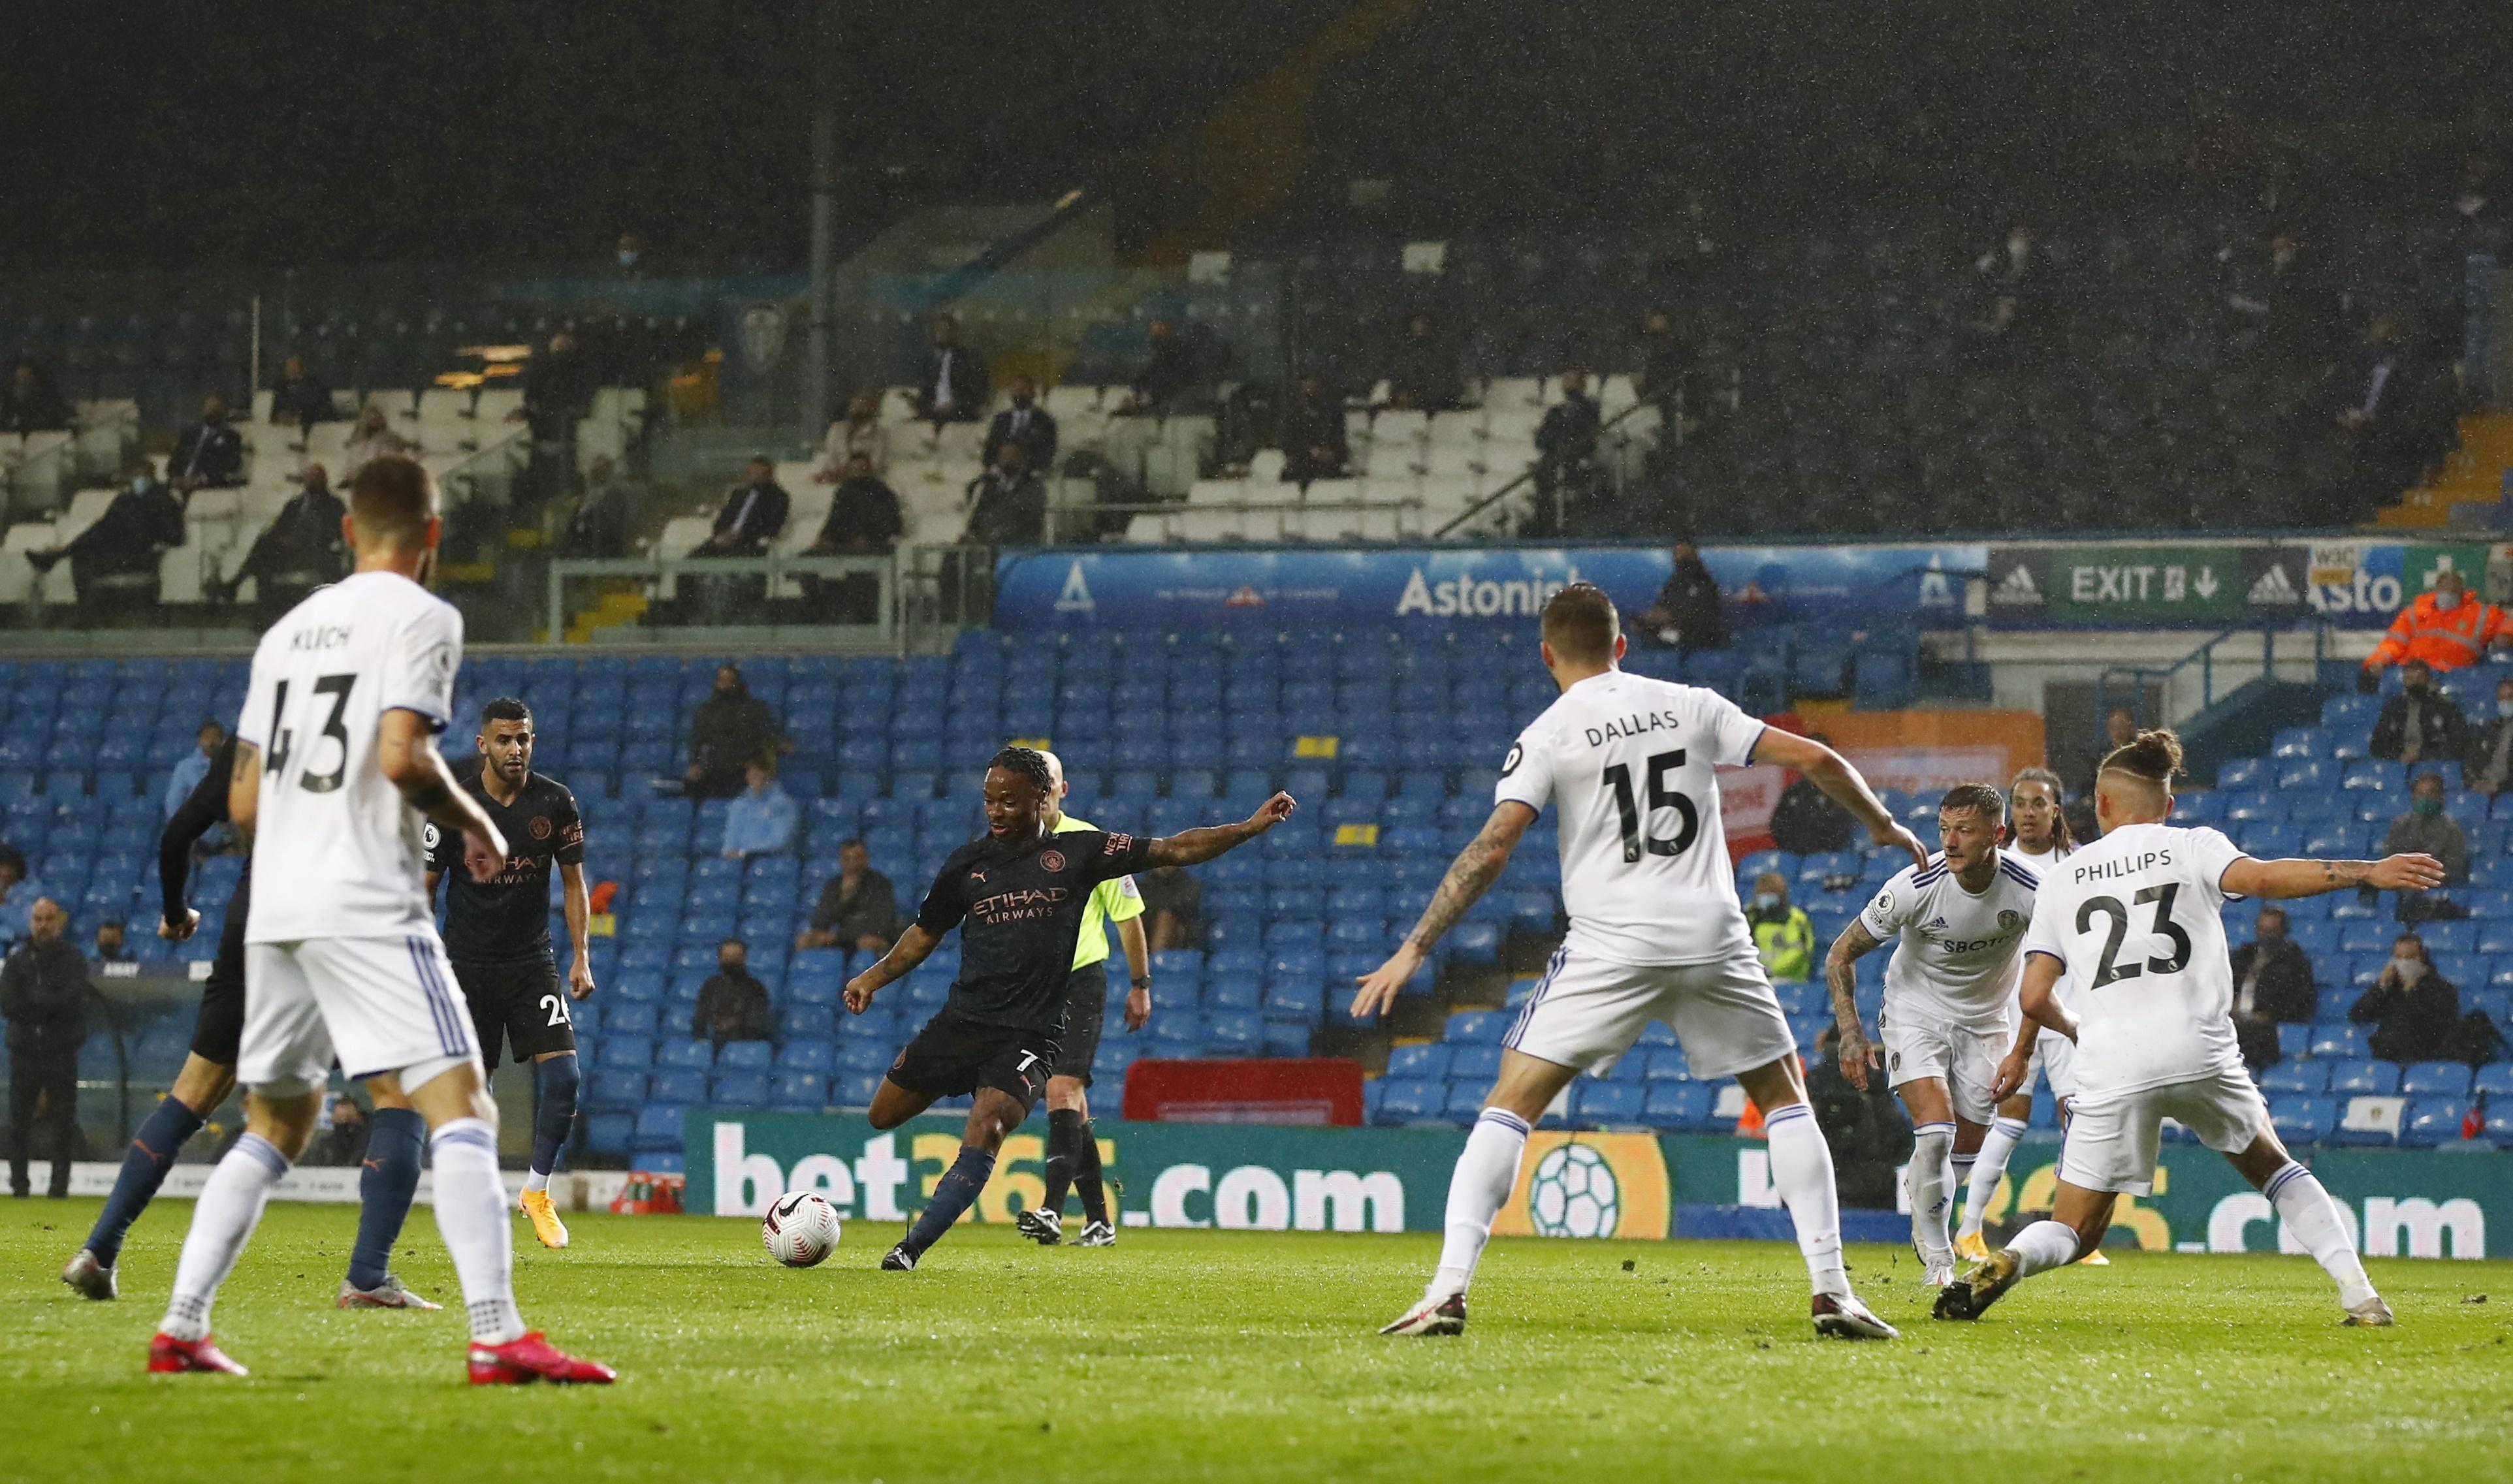 Leeds Utd dau voi Man City anh 12